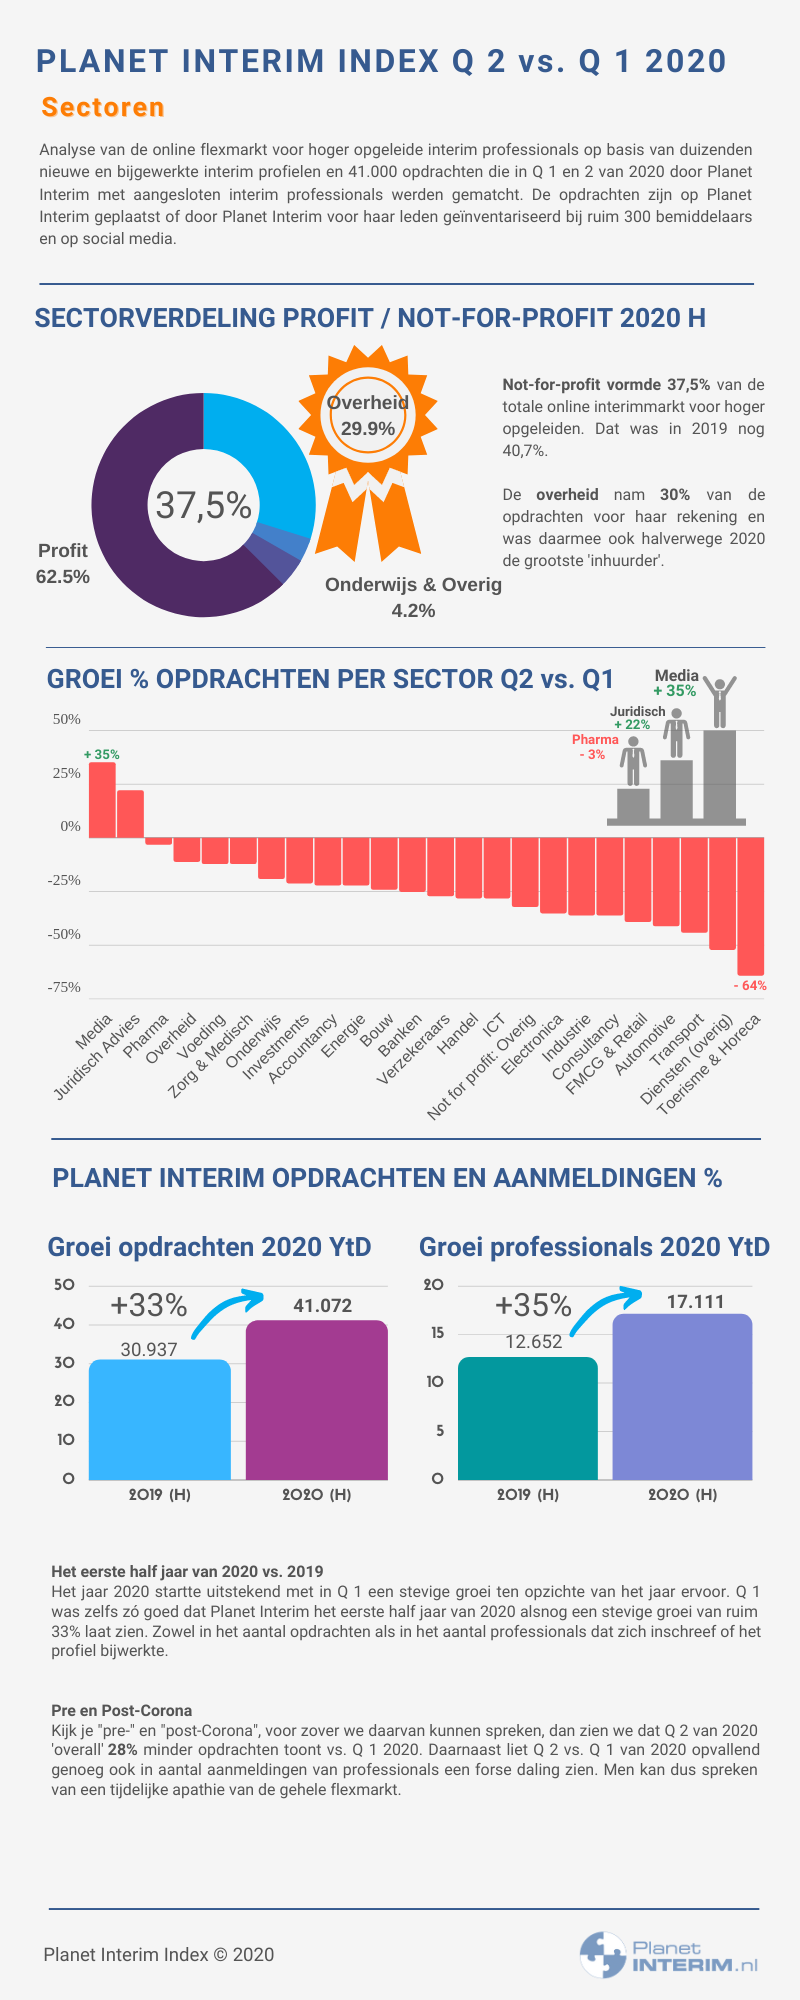 Planet Interim Index 2020 H sectoren